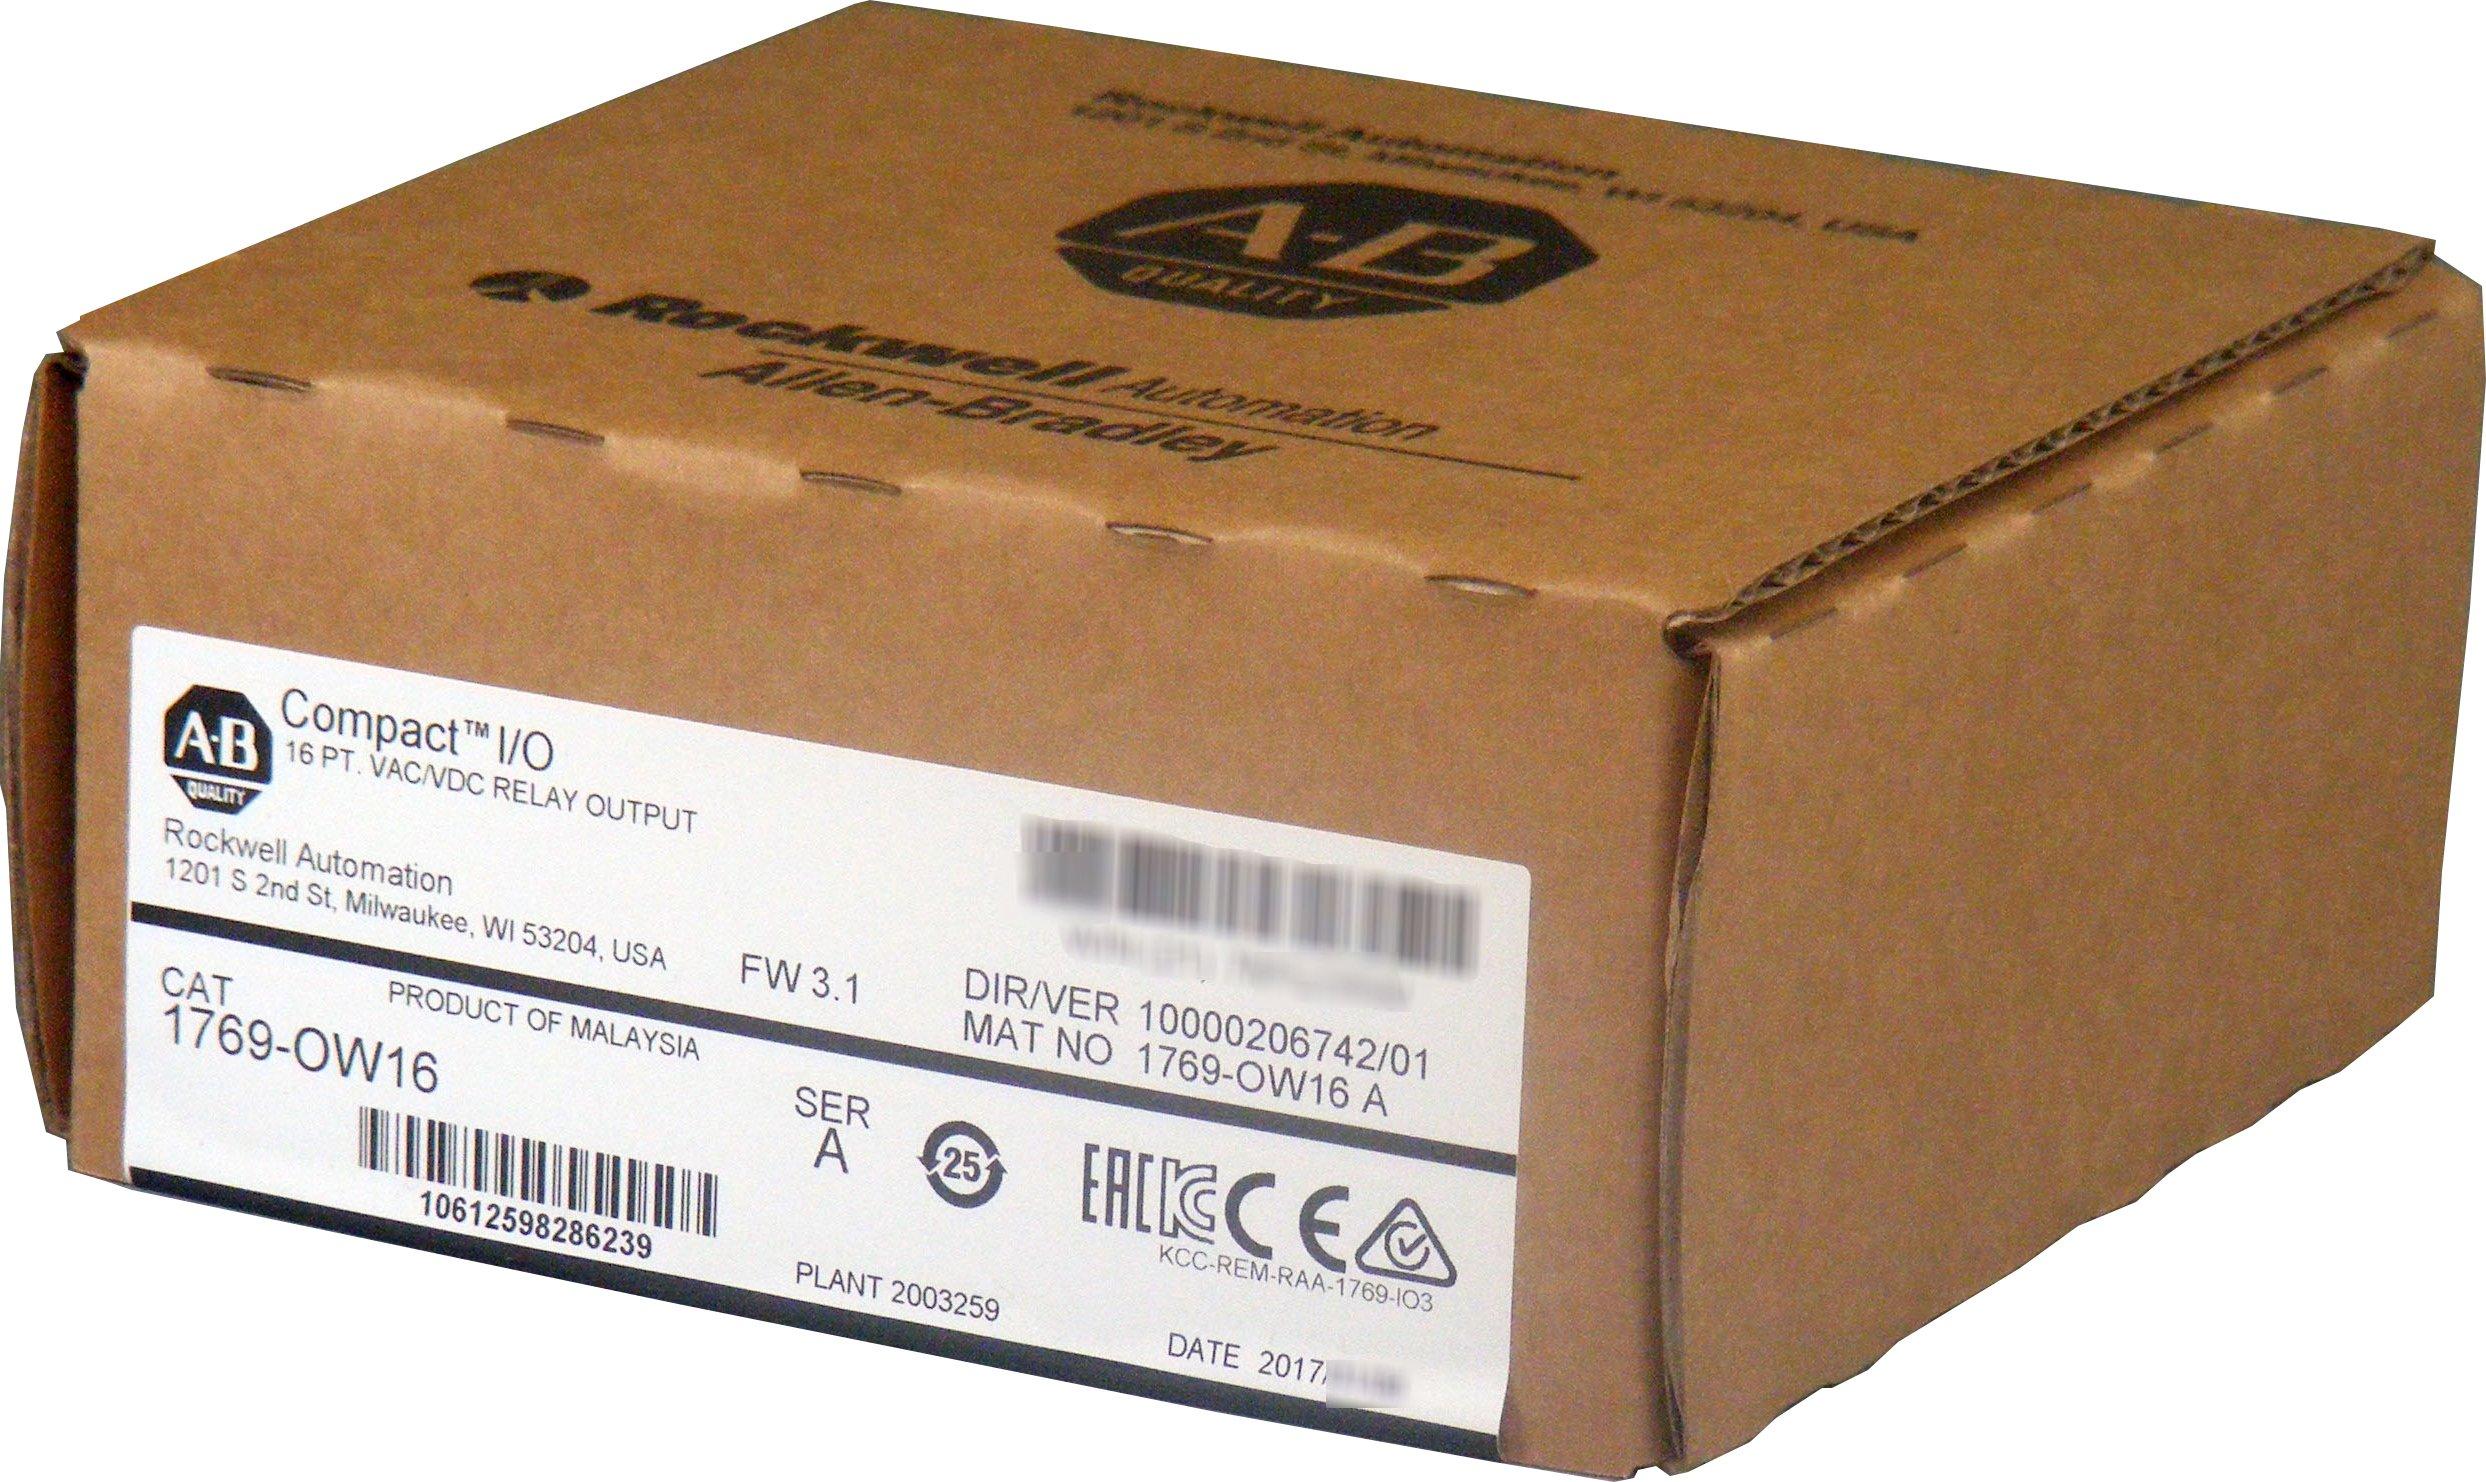 Allen Bradley 1769-OW16 Compact I/O Digital Output Module, 16-Point, 5 - 265 VAC / 5-125 VDC, Relay